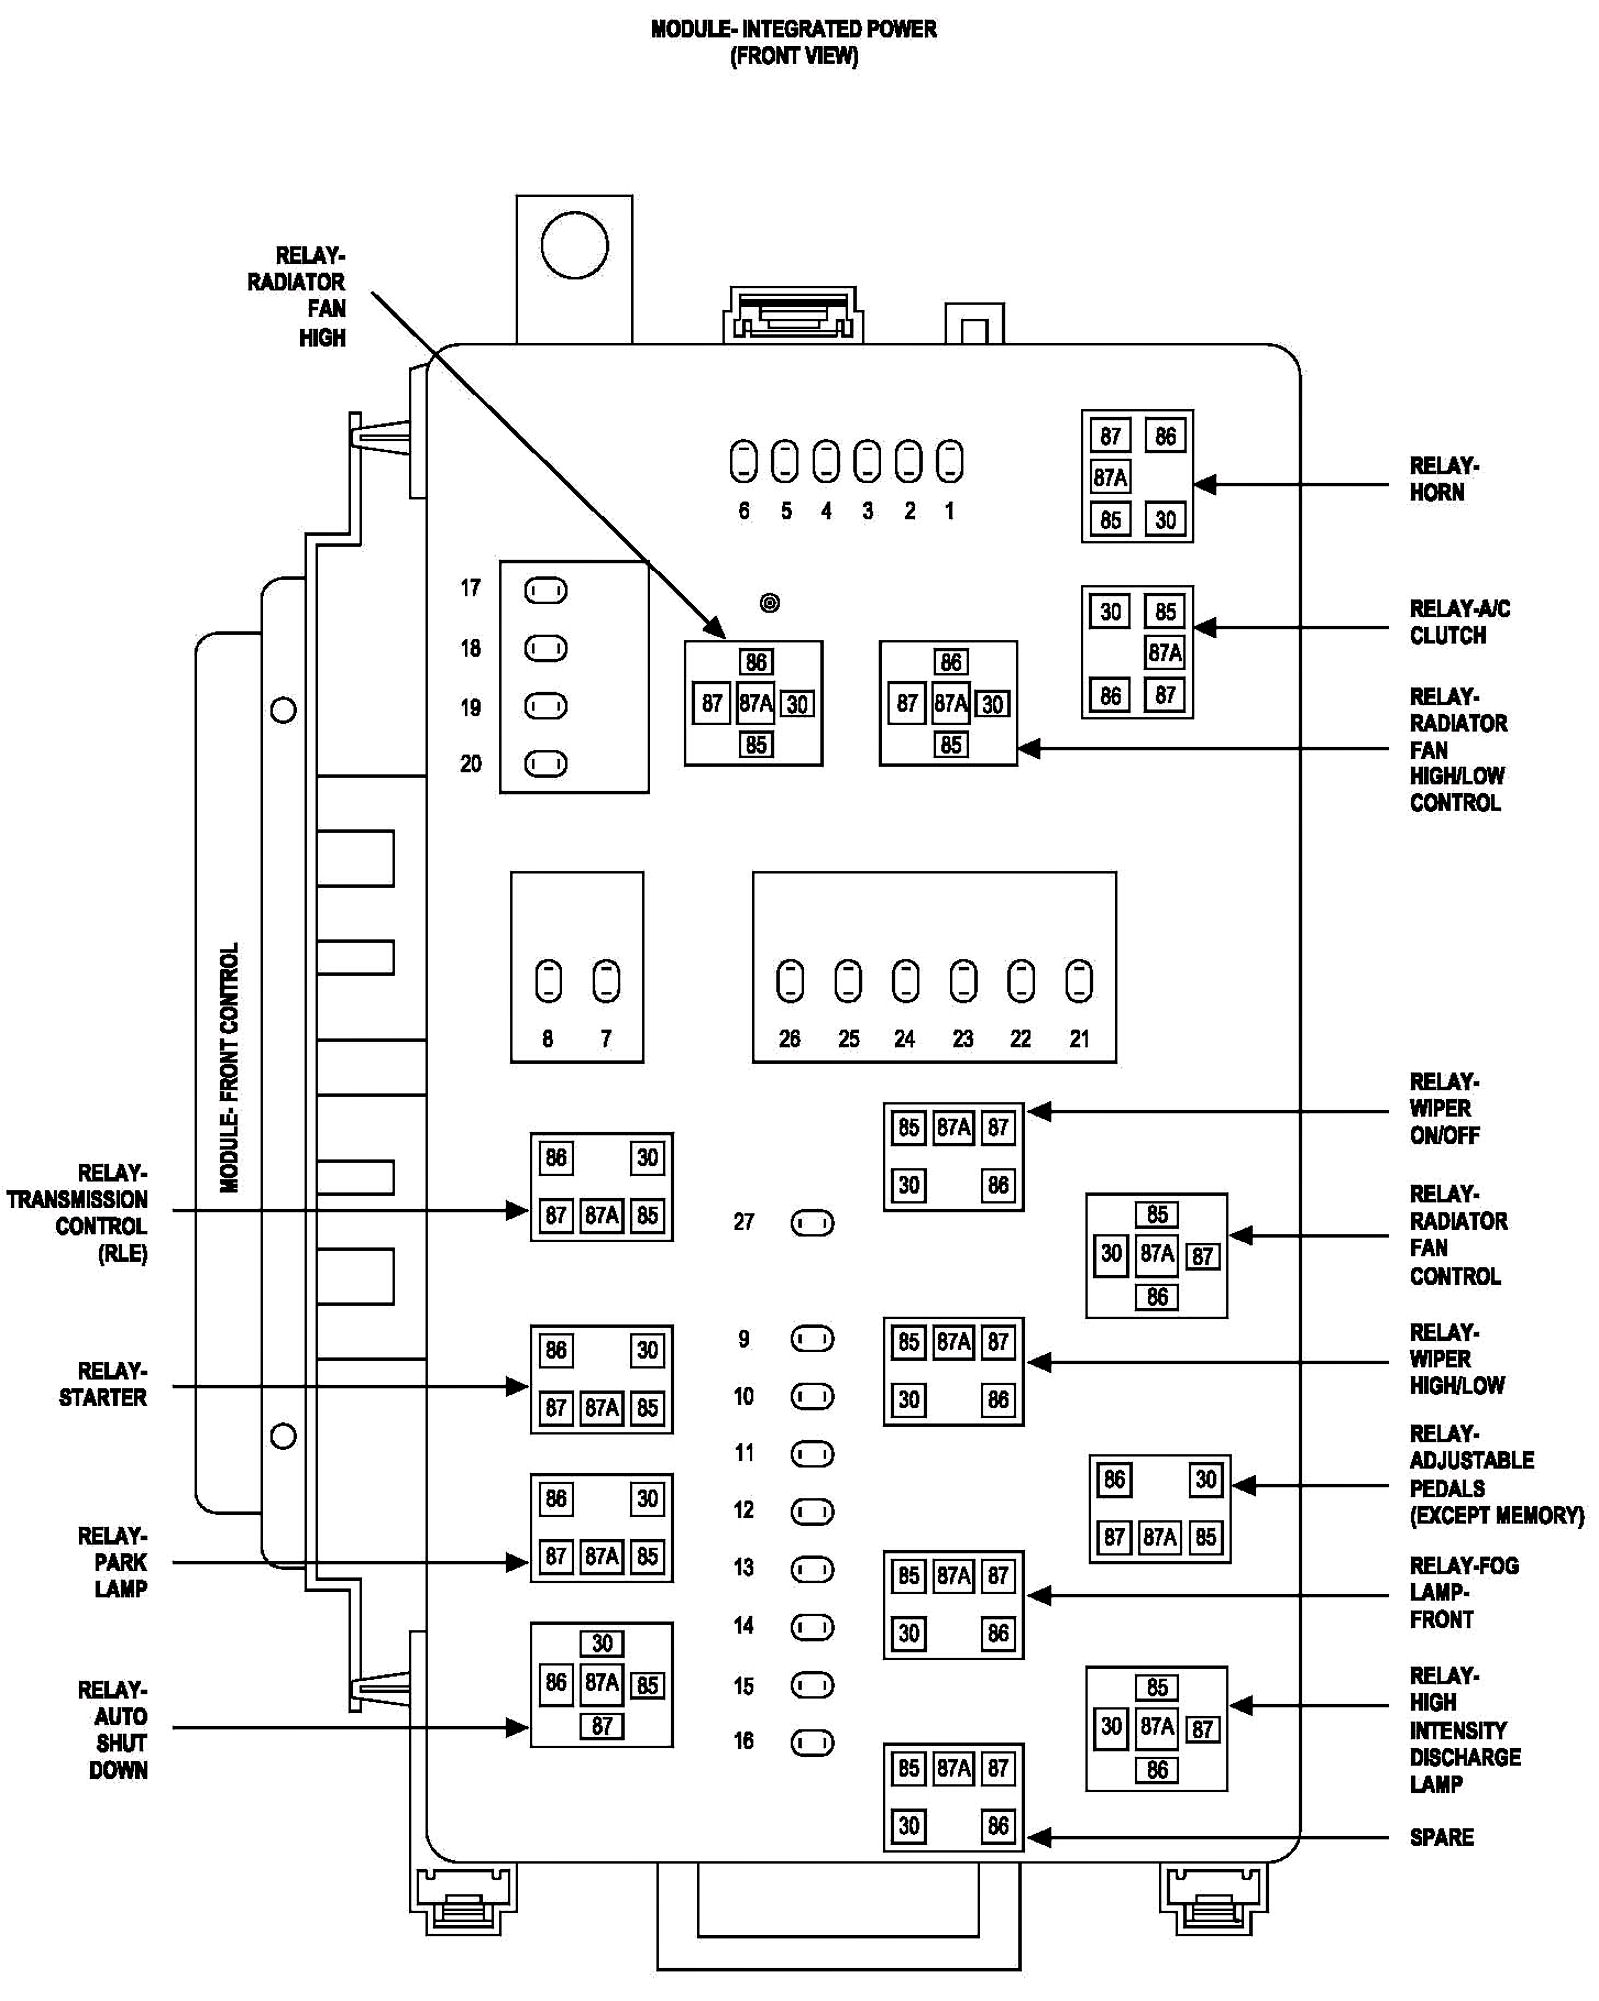 2005 Chrysler 300c Wire Harness Smoke 2000 Chrysler 300M Engine Diagram  Chrysler 300 2 7 Engine Diagram Starter Relay